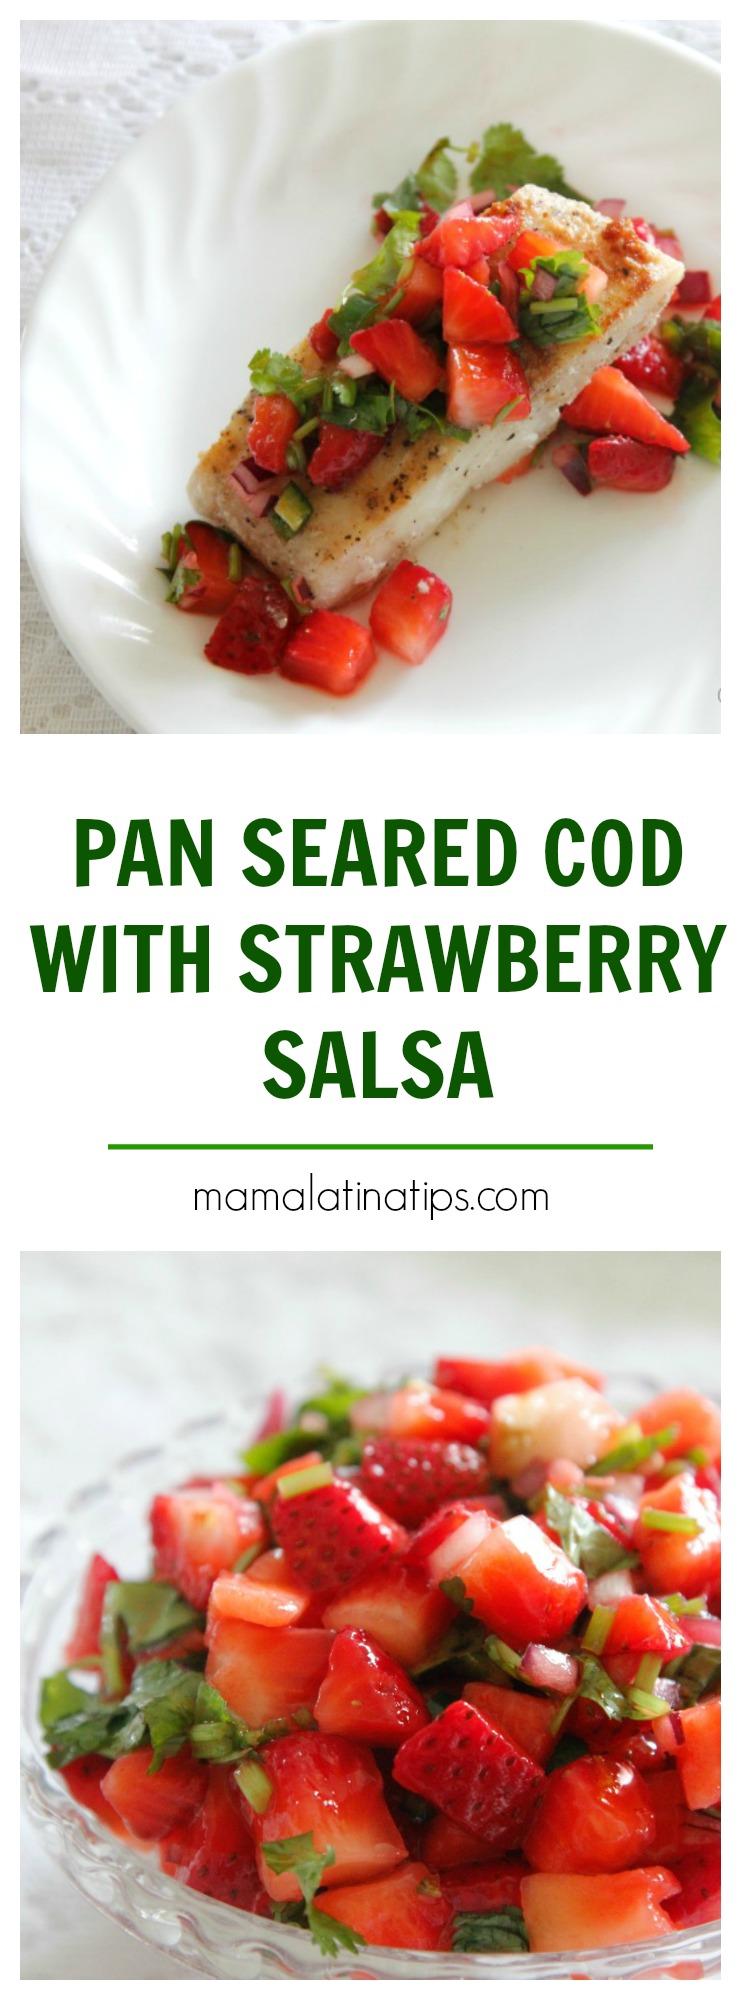 pan seared cod with strawberry salsa pin - Mama Latina Tips